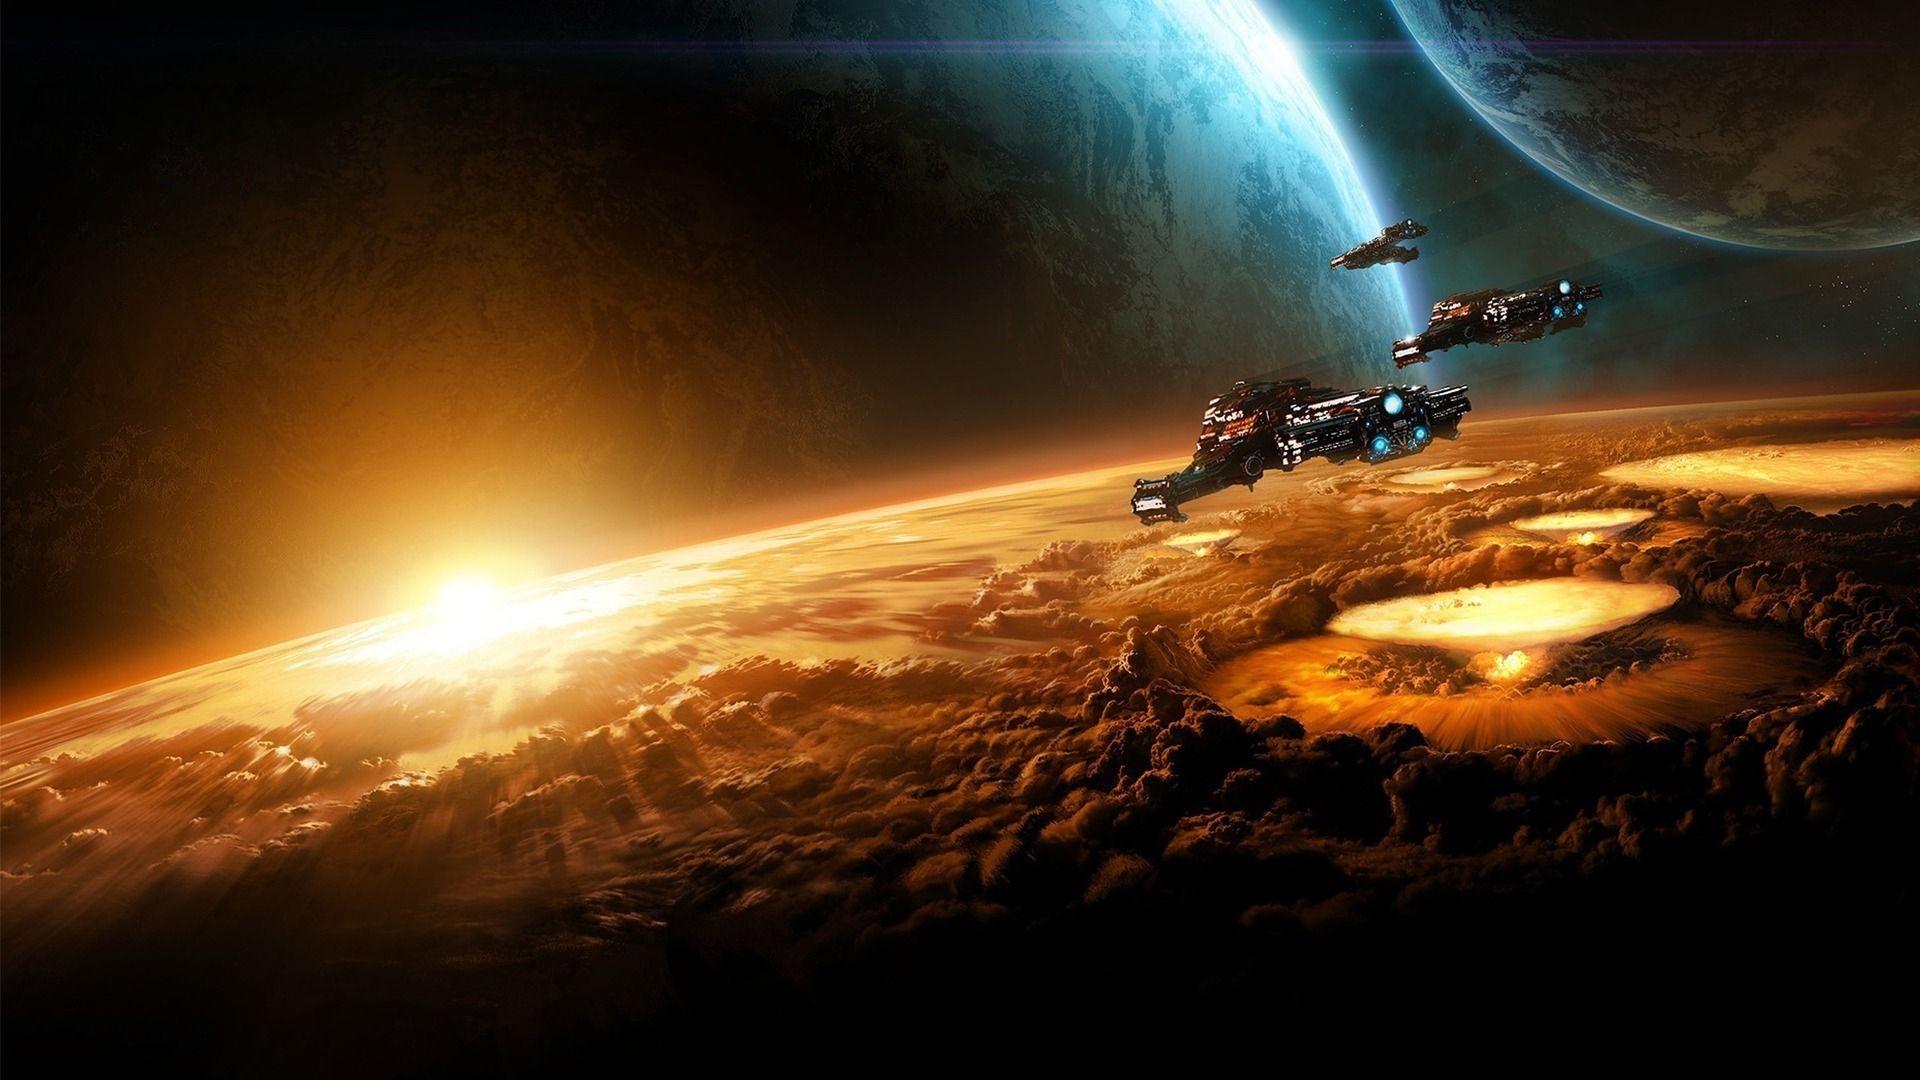 spaceship wallpaper widescreen design ideas alien